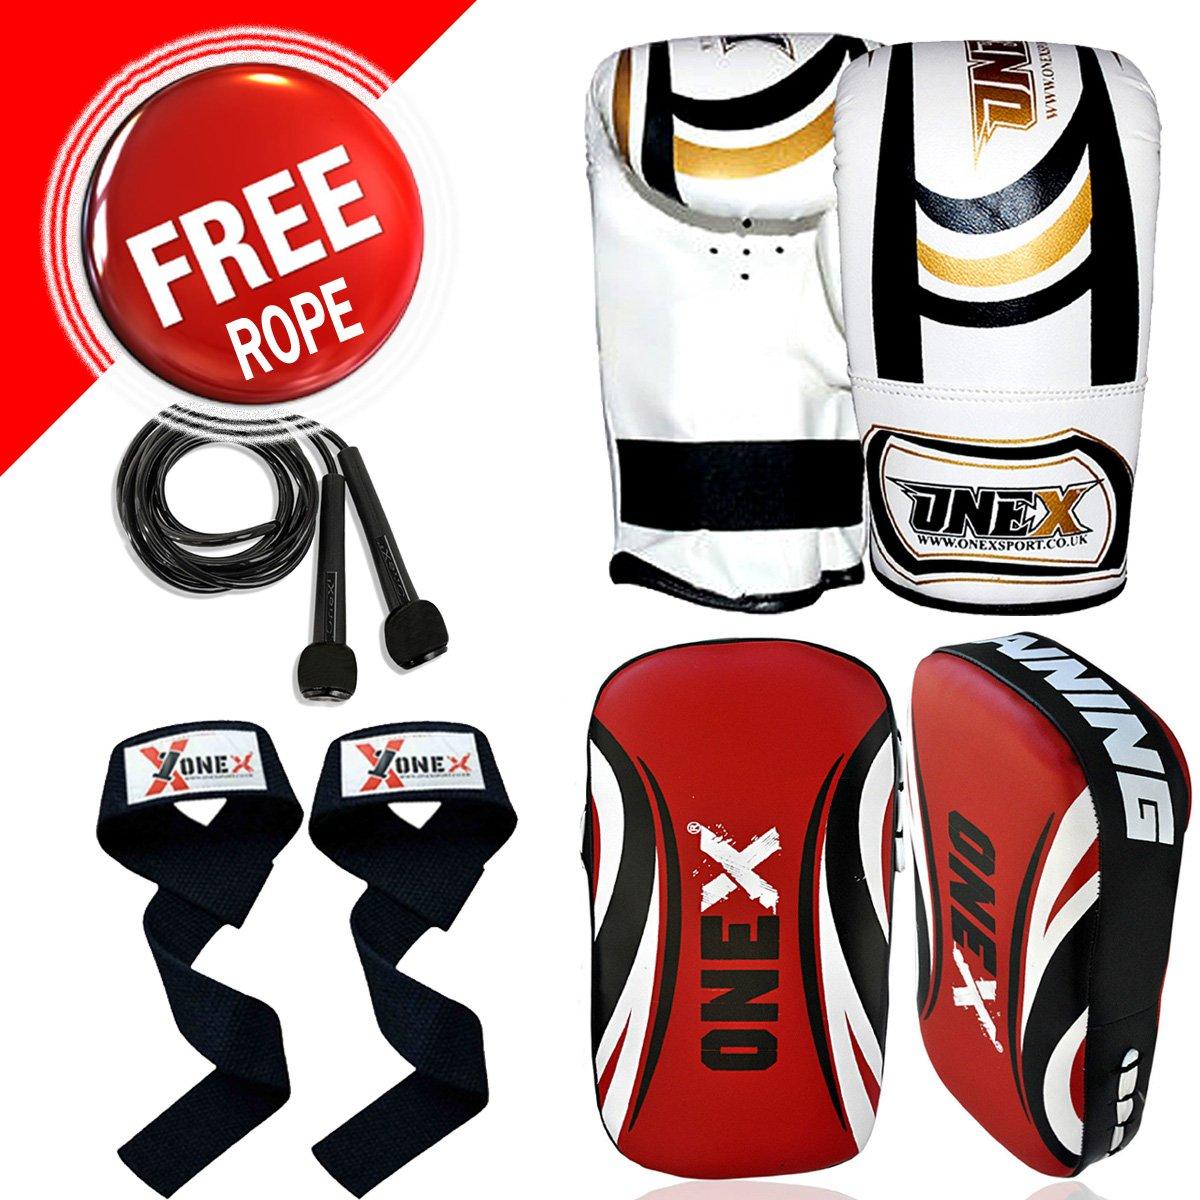 Professional Boxing Set, Punch Bag Set, Boxing Gloves, Boxing Kick Pad, Training Set, MMA Set, Adult Boxing Gym Straps Set For Men's & Ladies with Free Rope (Single Kick Pad) onex